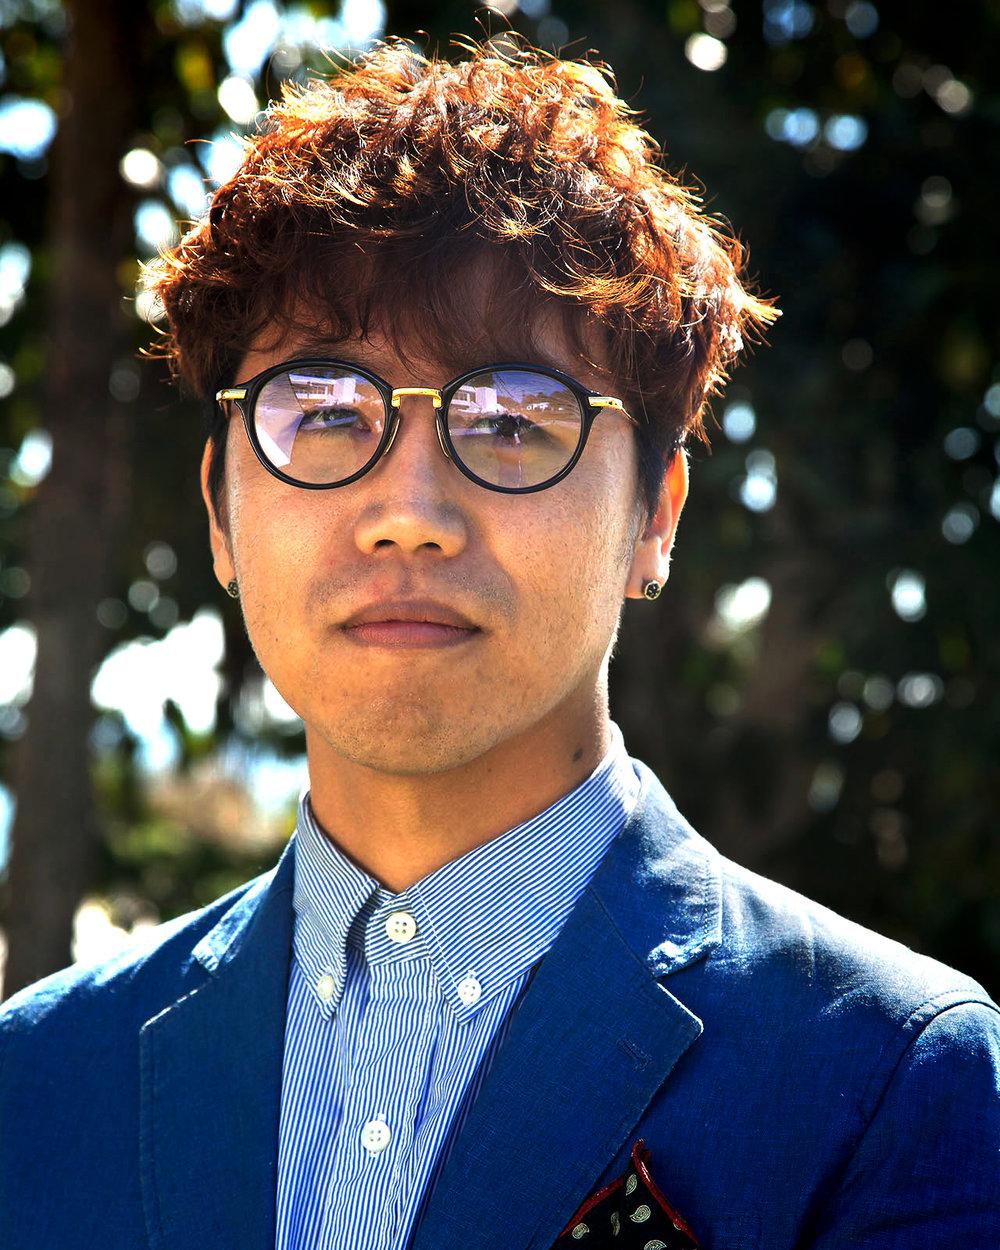 Yeihoon Choi